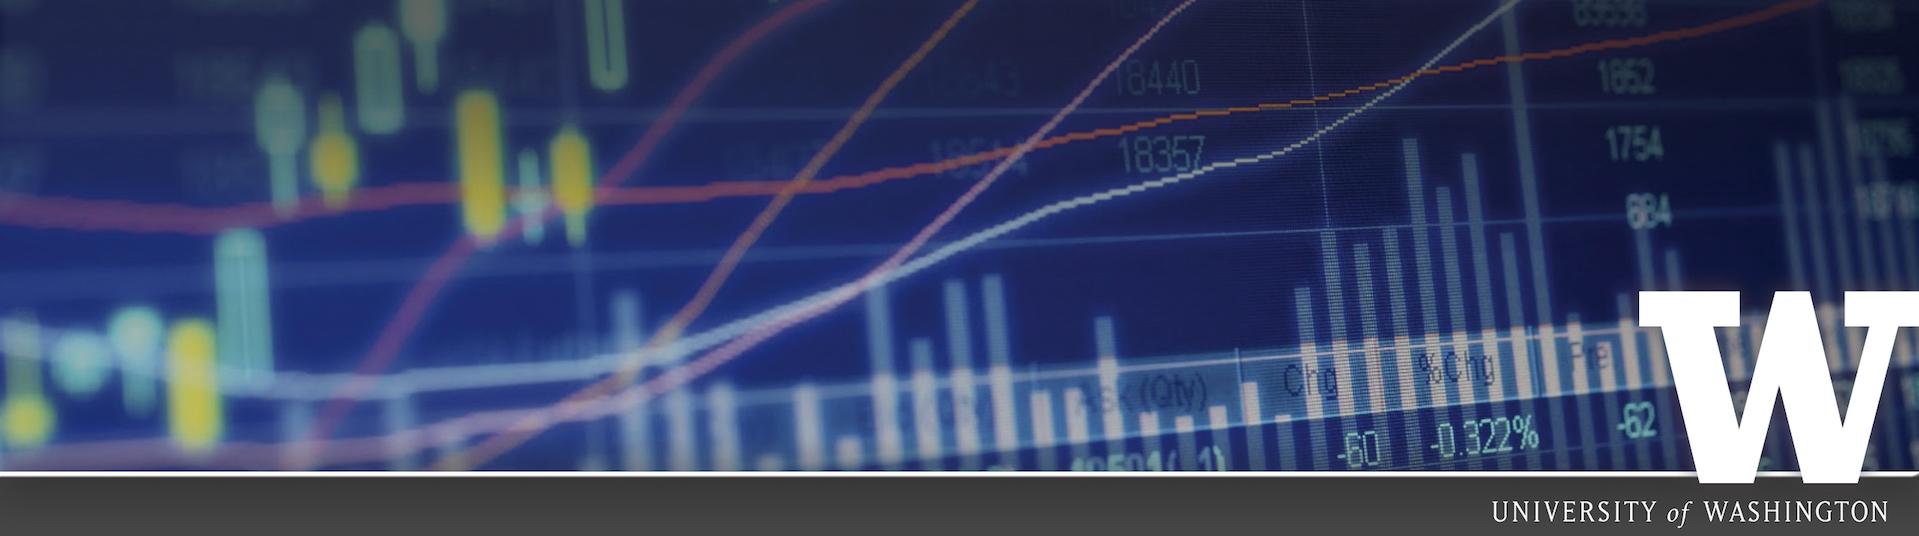 UW Computational Finance & Risk Management